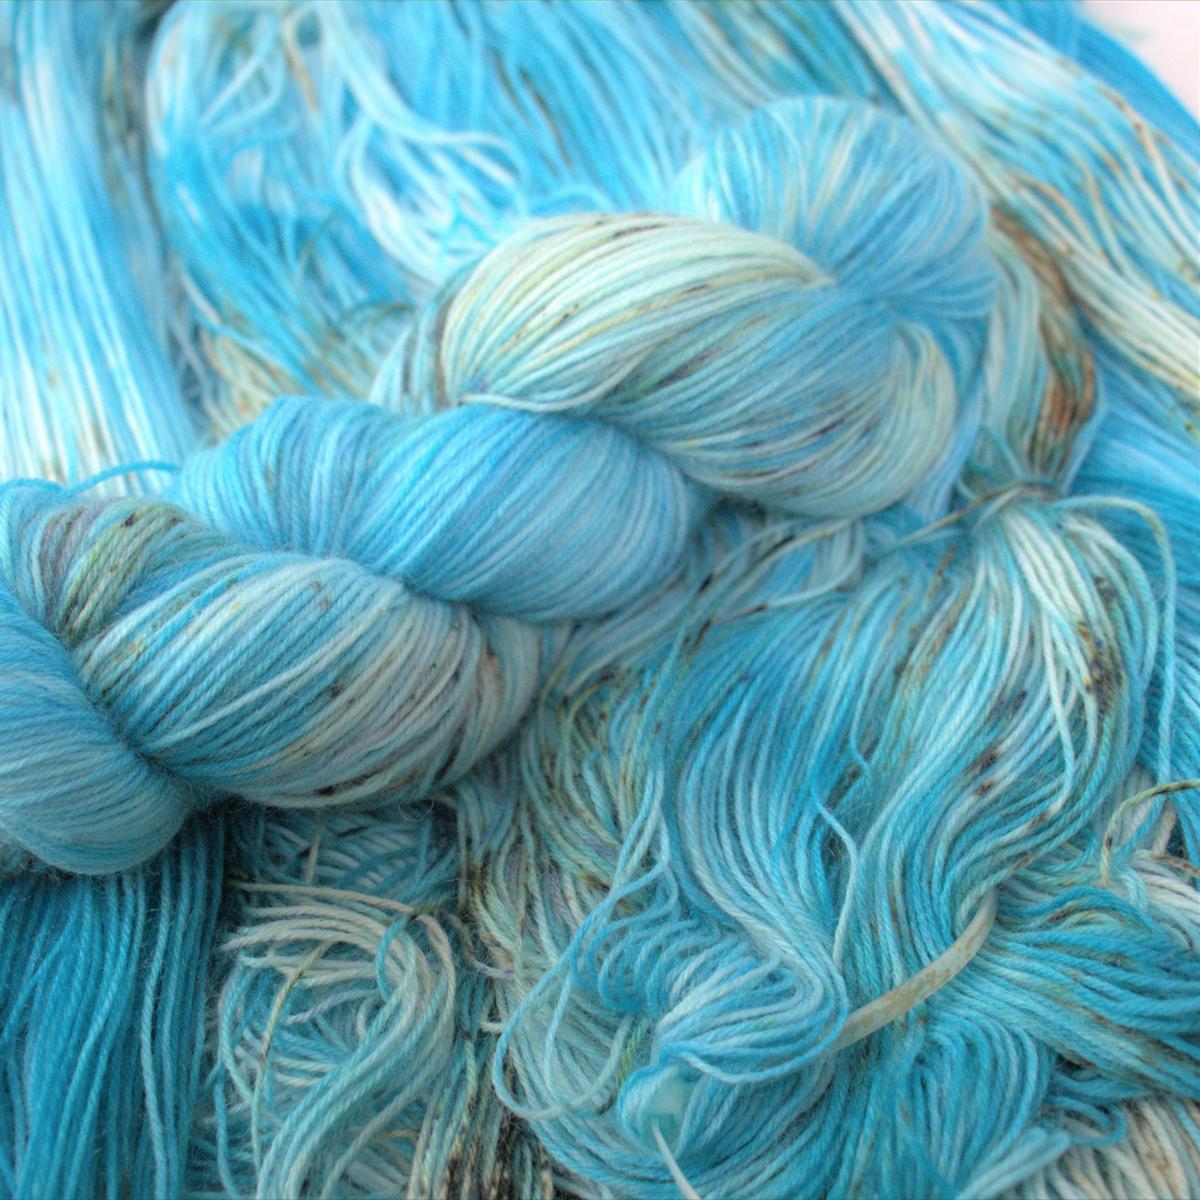 woodico.pro hand dyed yarn 050 4 1200x1200 - Hand dyed yarn / 050